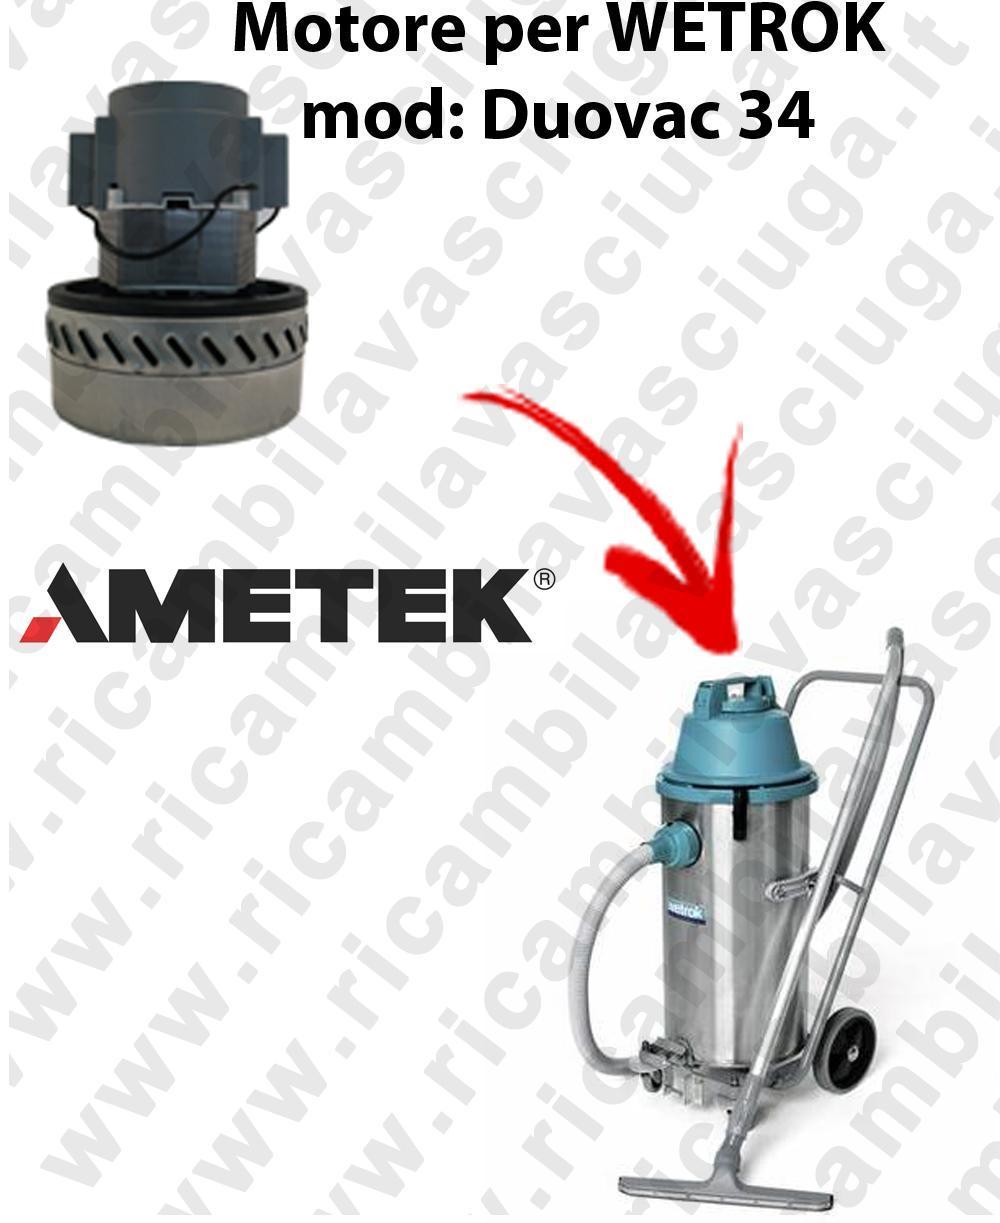 DUOVAC 34 Motore de aspiración AMETEK  para aspiradora WETROK